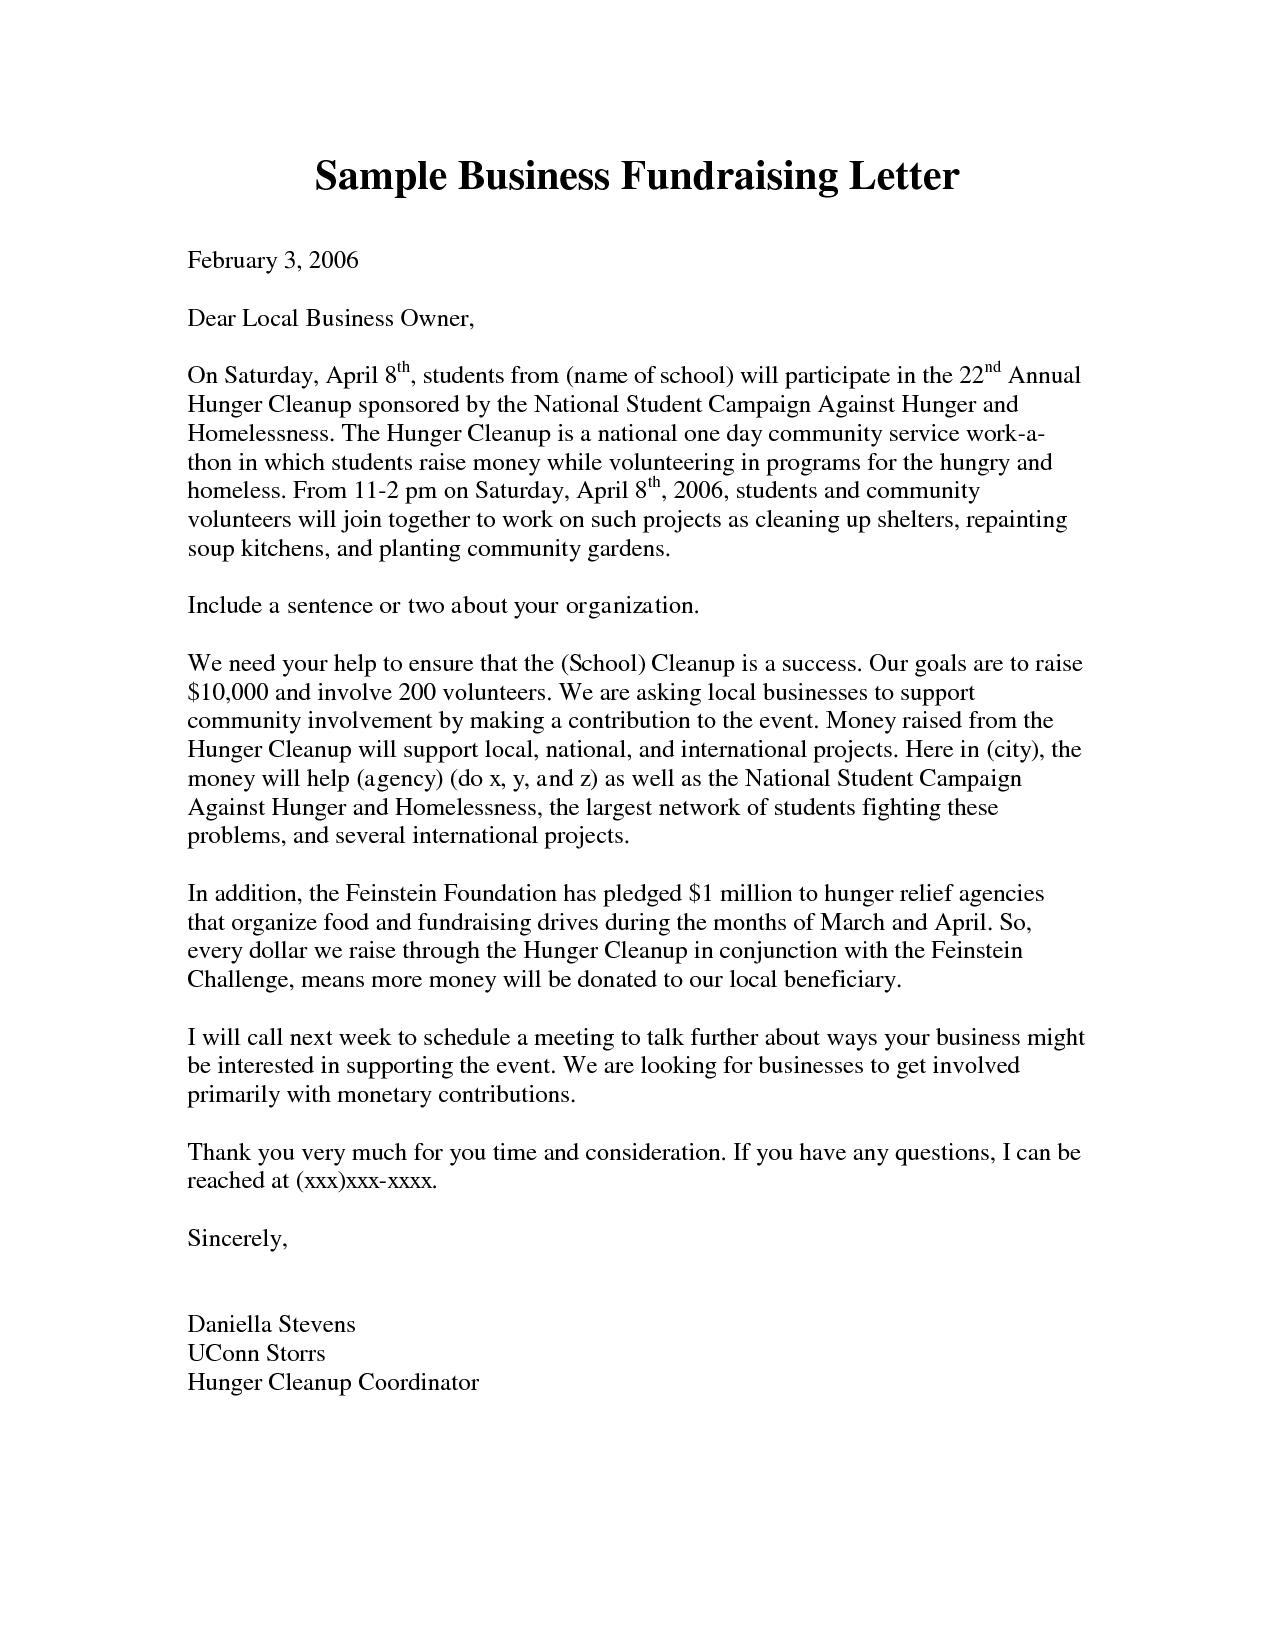 Business Fundraising Letter Sle Fundraising Letters  Nonprofit Regarding Political Fundraising Letter Template